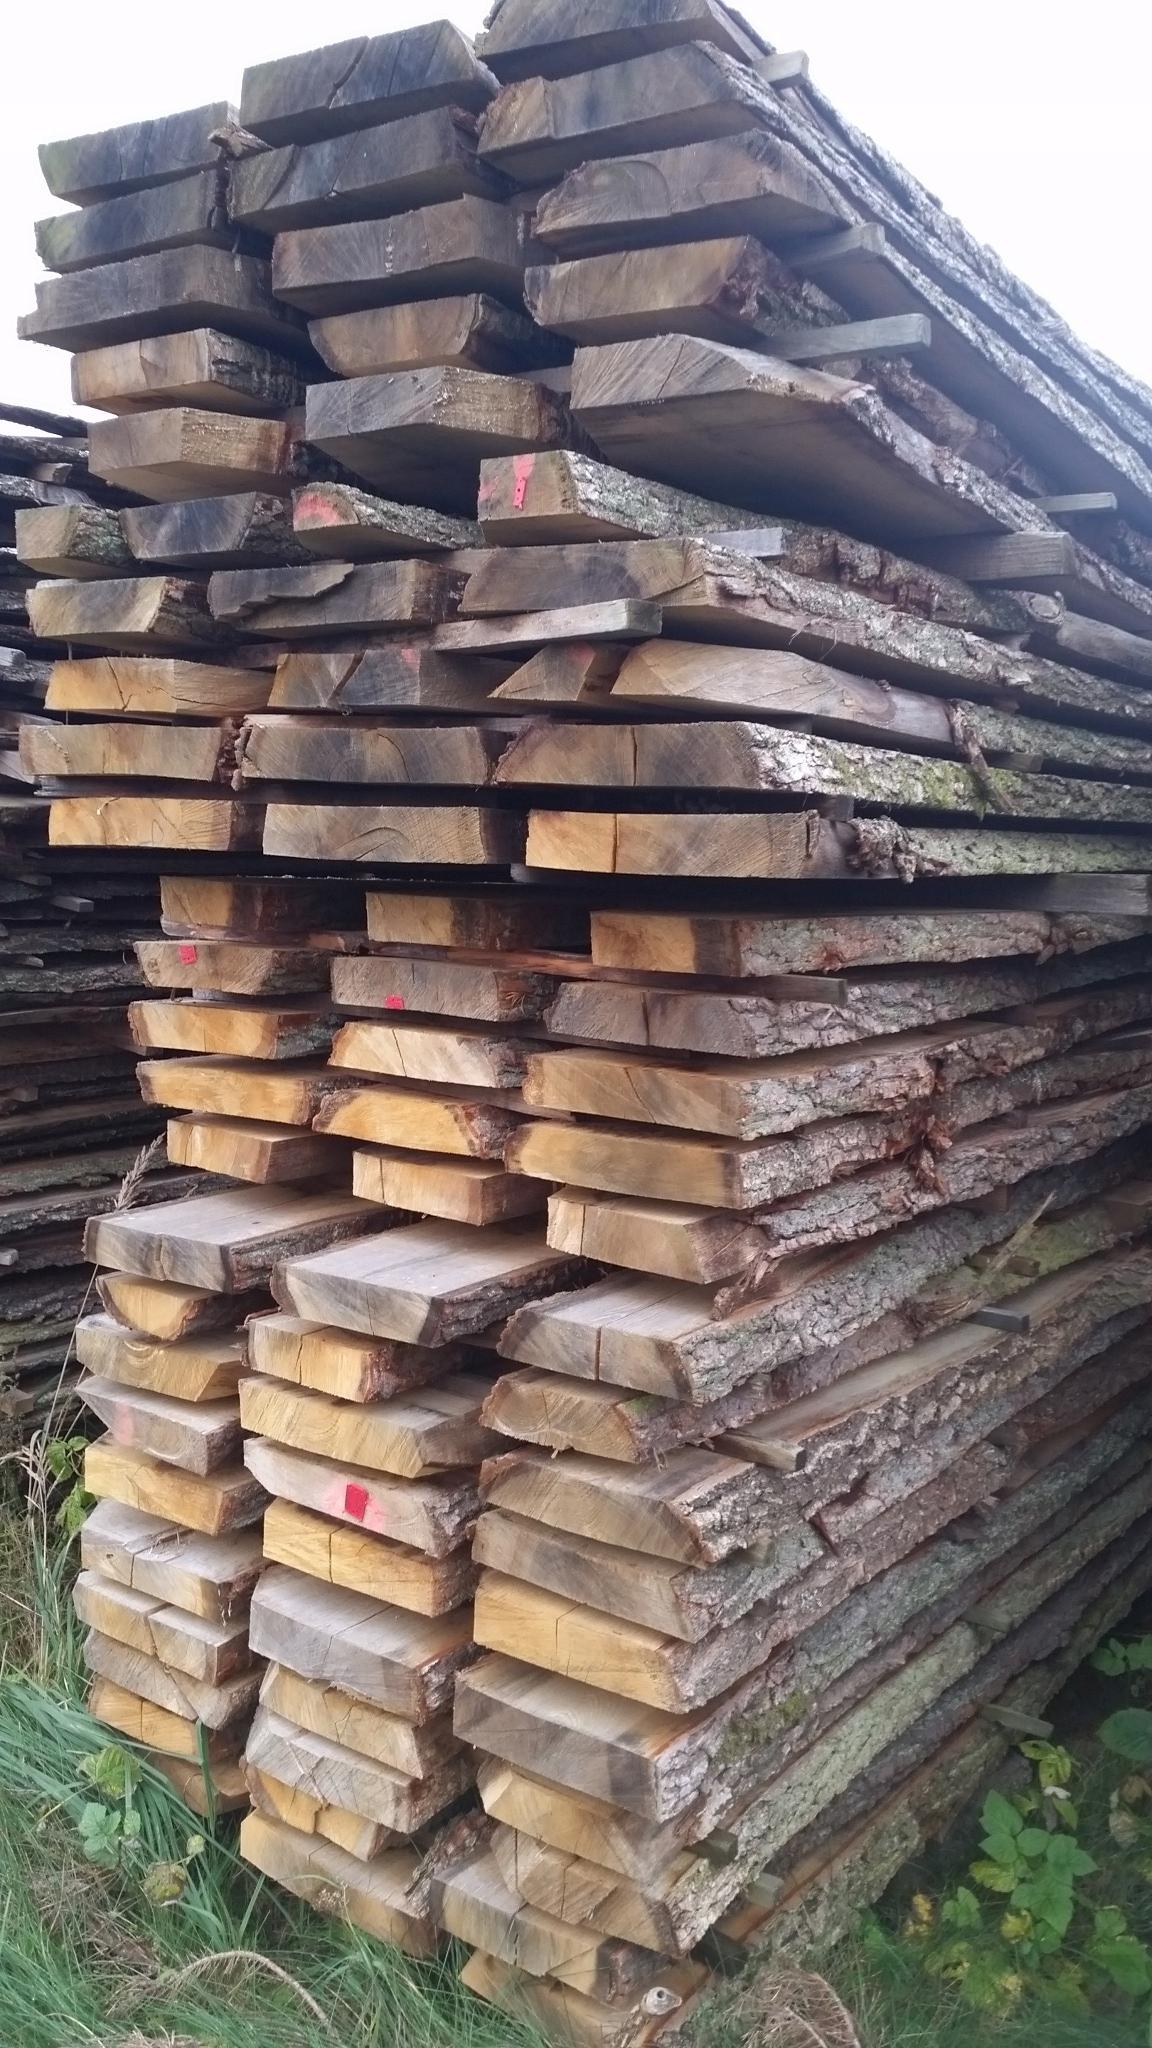 Uslugi Suszenia Drewna Suszenie Uslugowe 7756559108 Allegro Pl